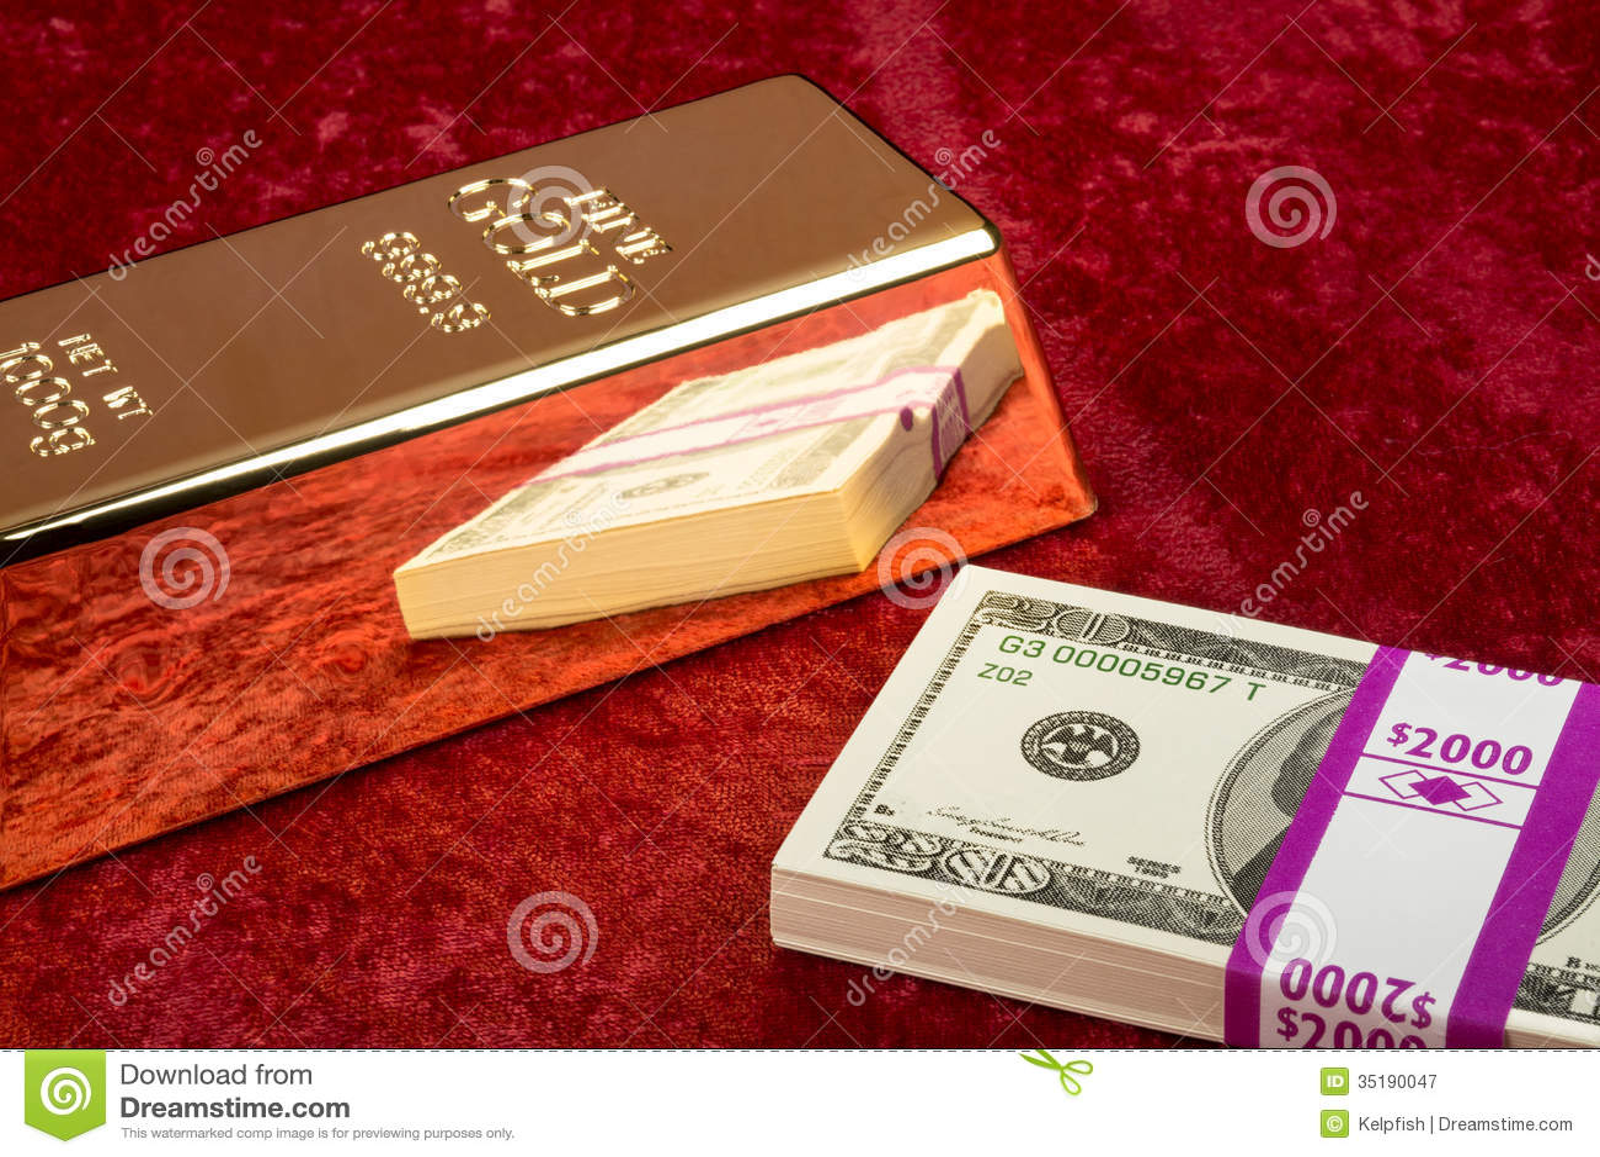 Download Gold Bar And Cash Stock Image Of Felt Ingot